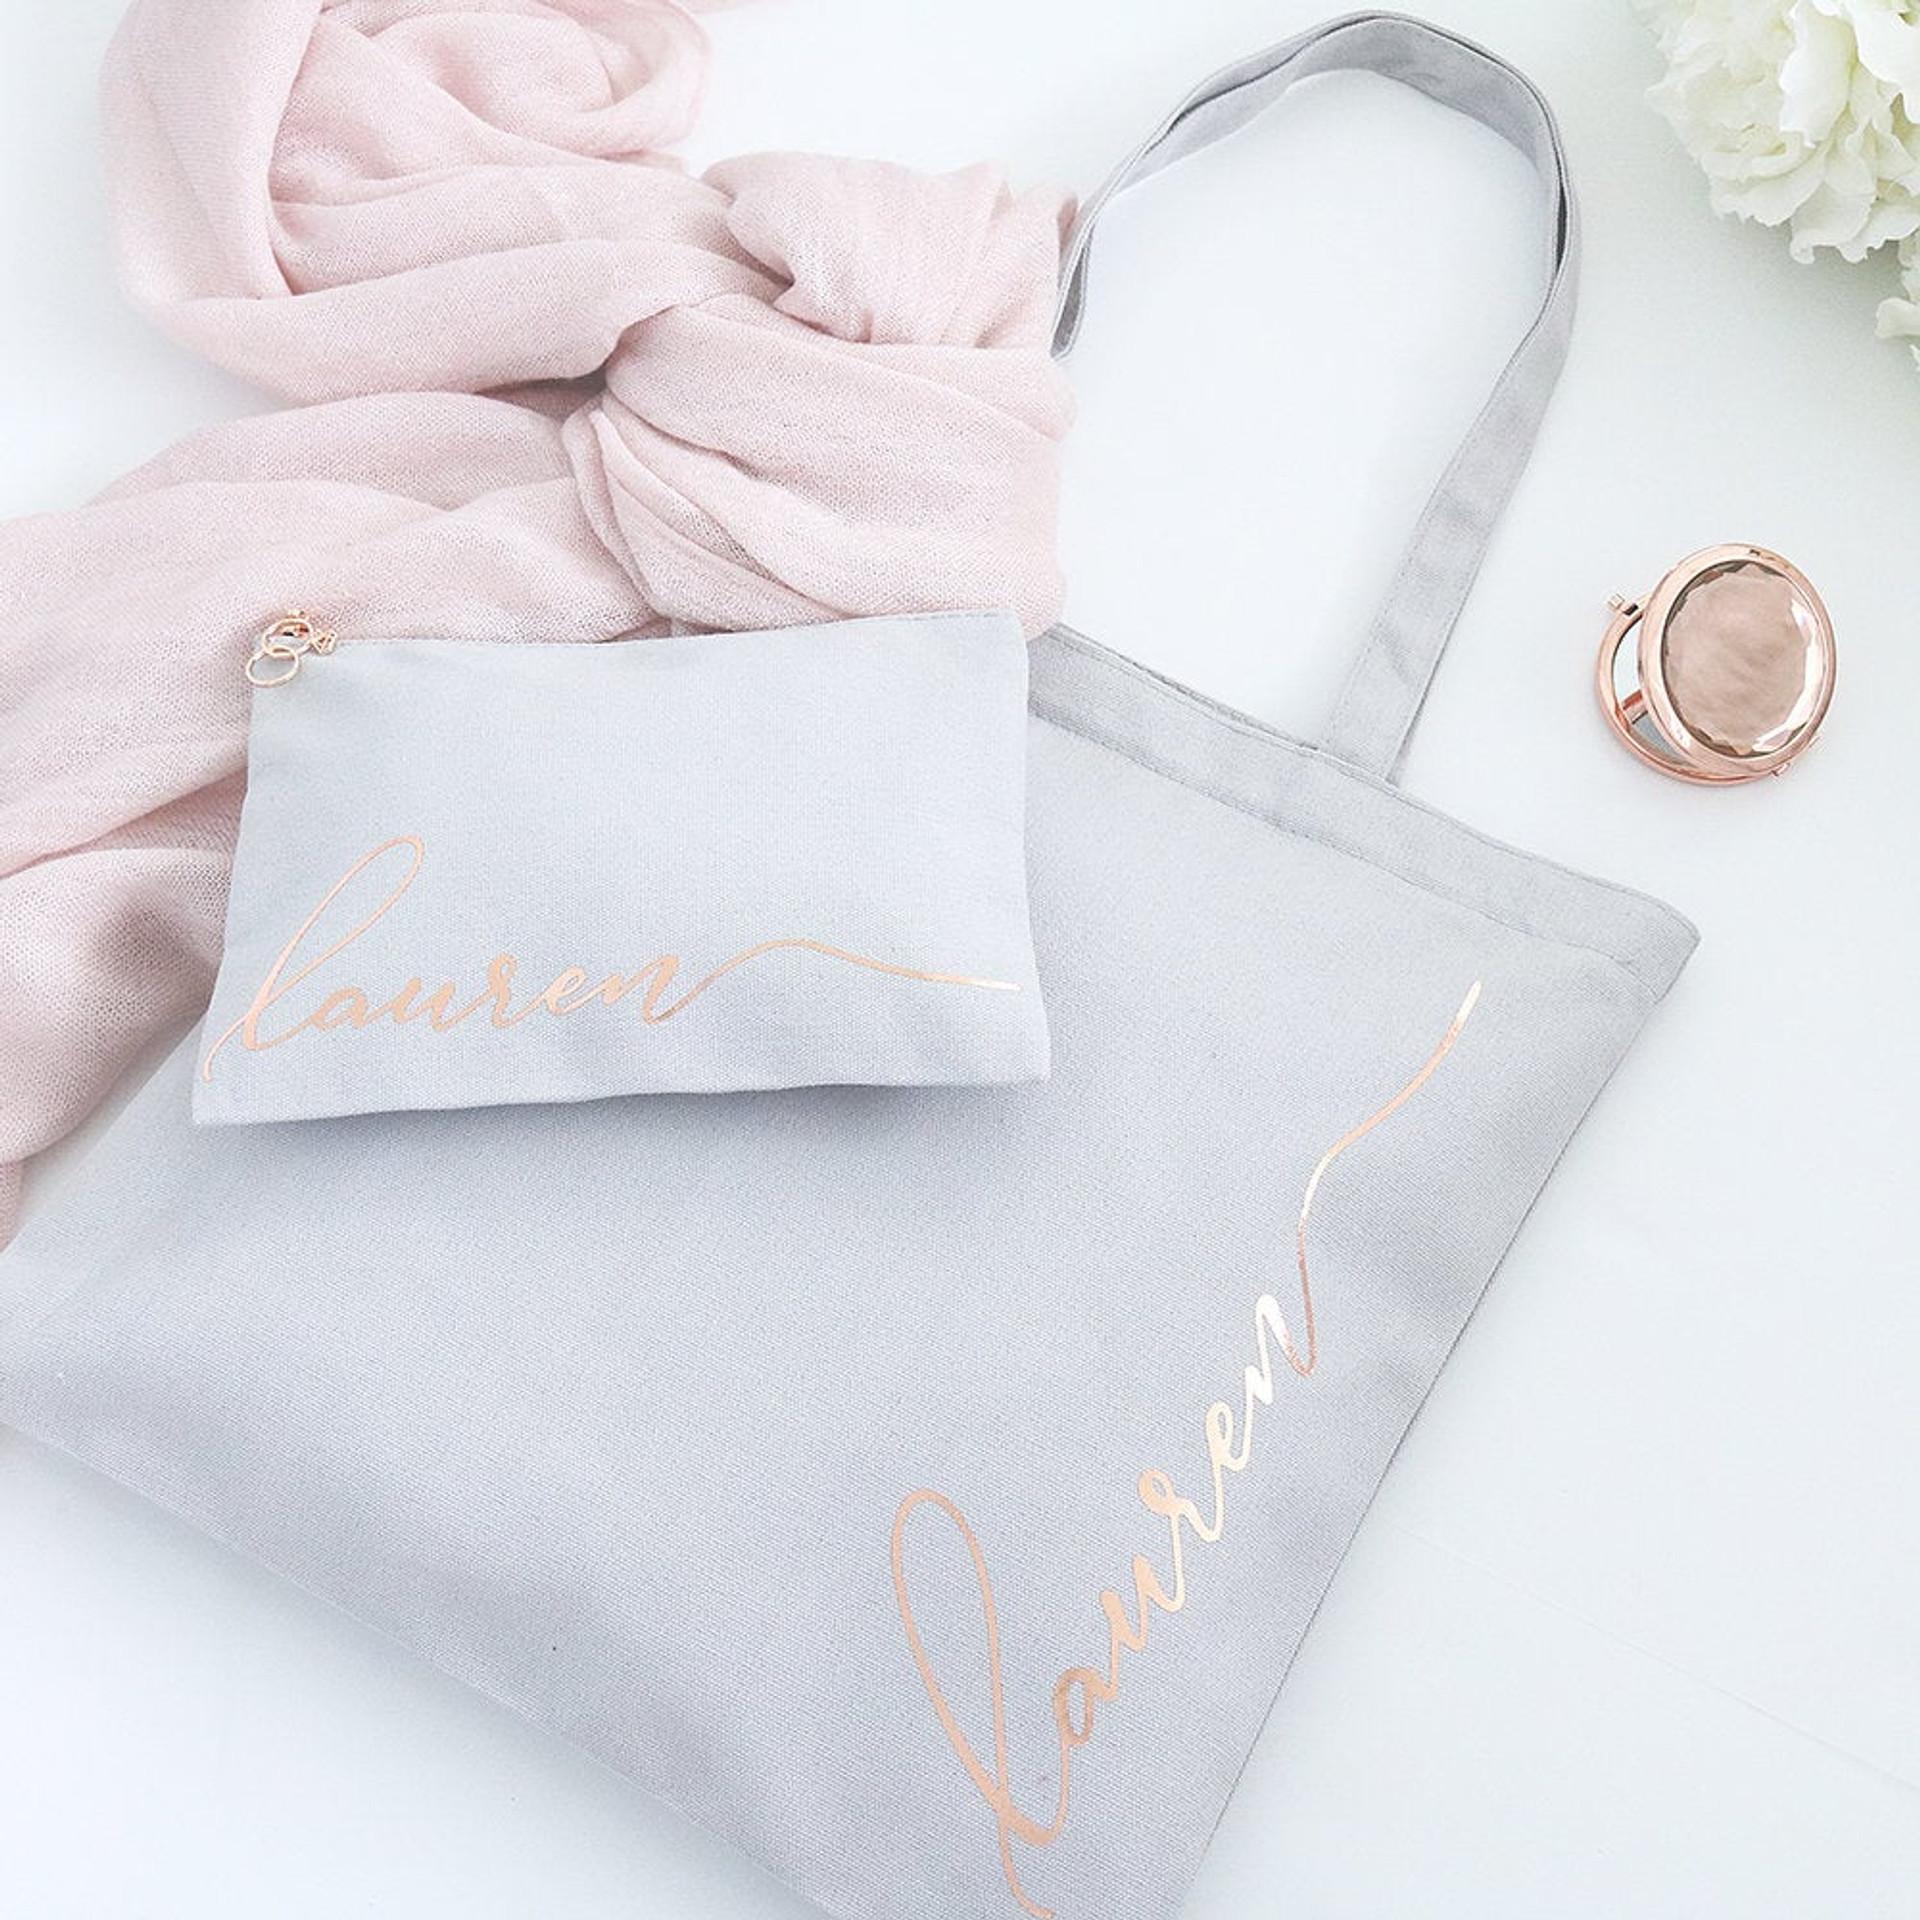 Rose Gold Zipper Tote Bag